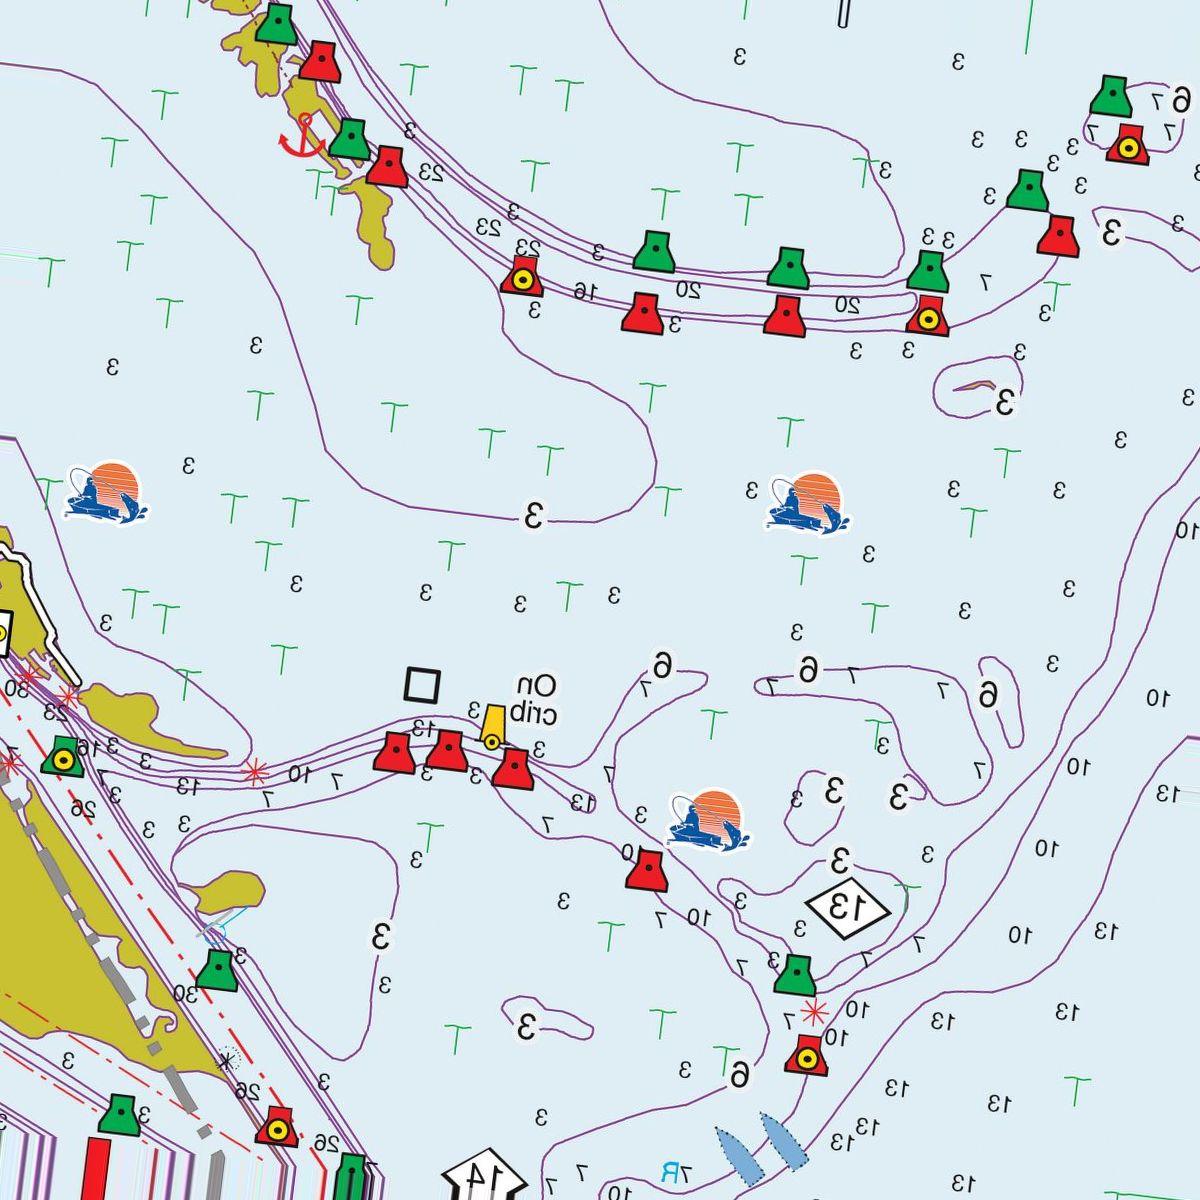 Fishing Hot Spots Pro Digital Mapping